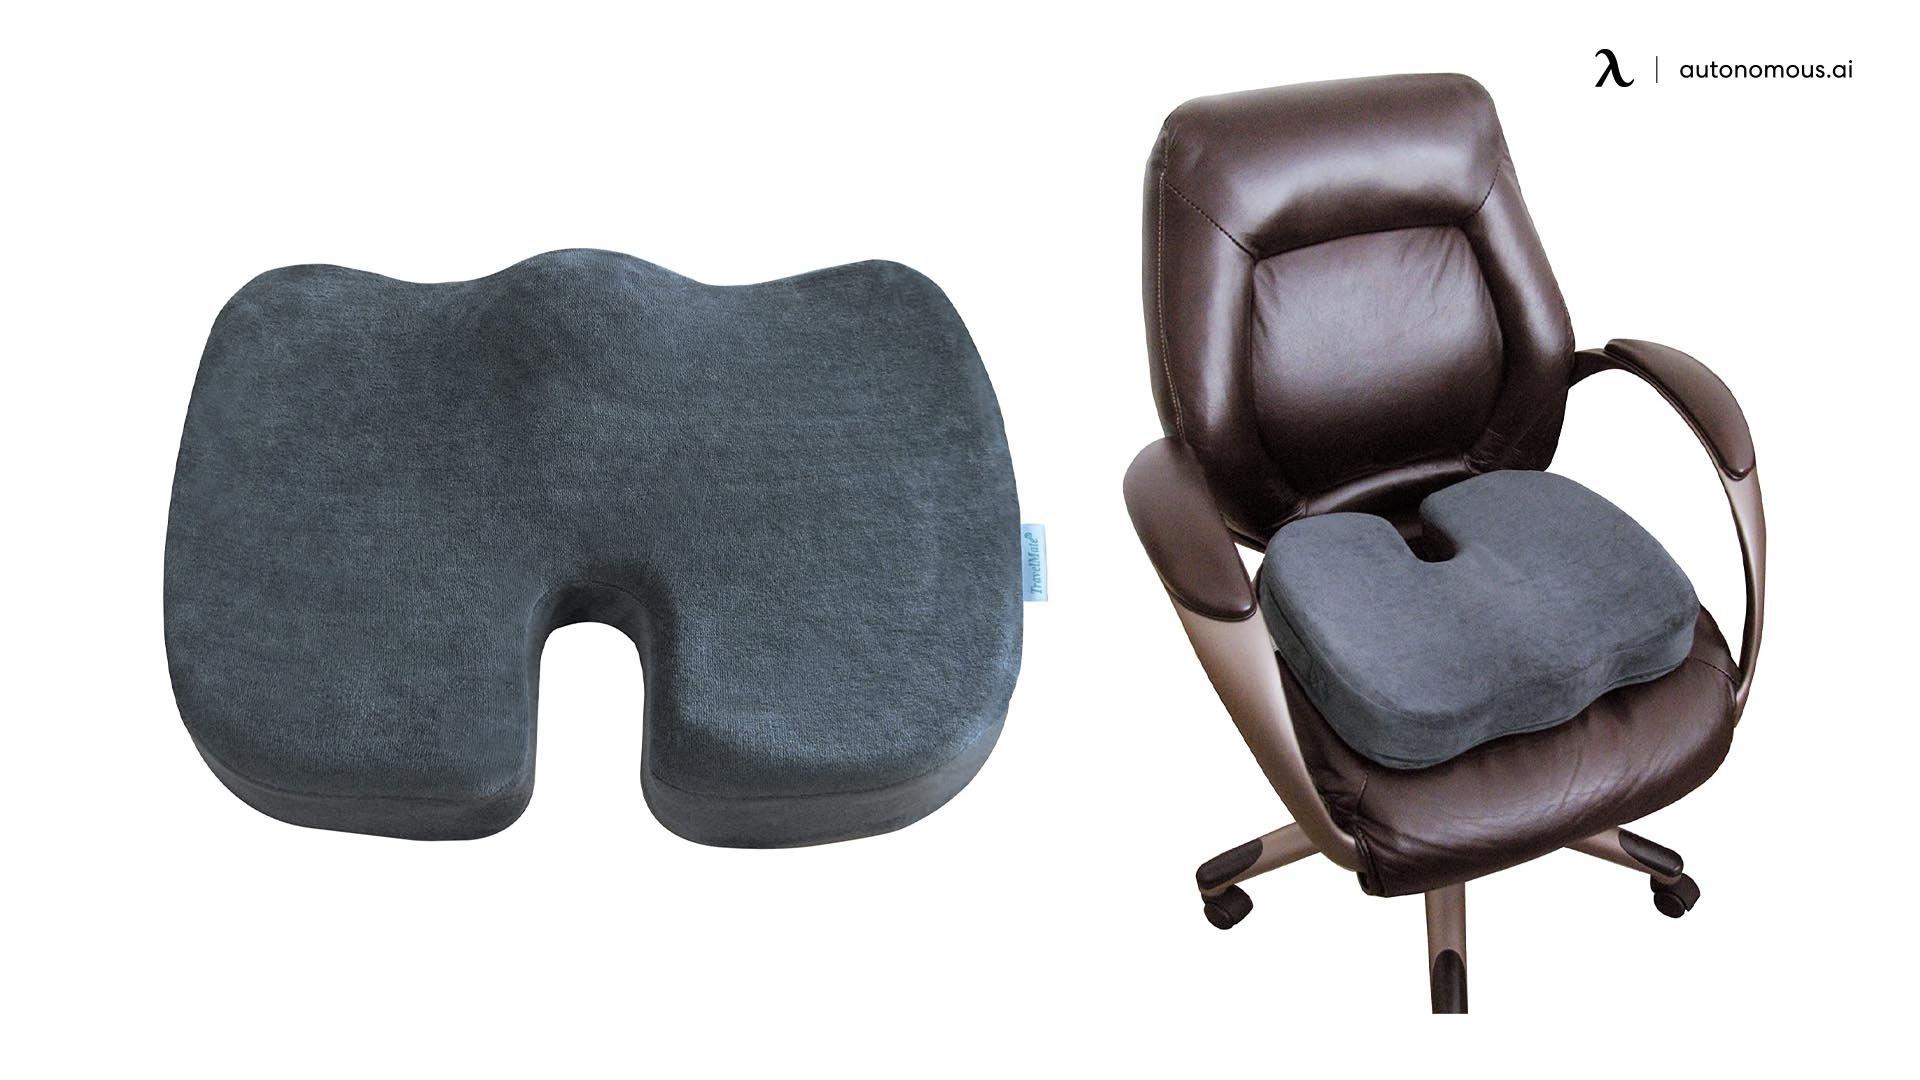 TravelMate's latest Coccyx Orthopedic Gel seat cushion